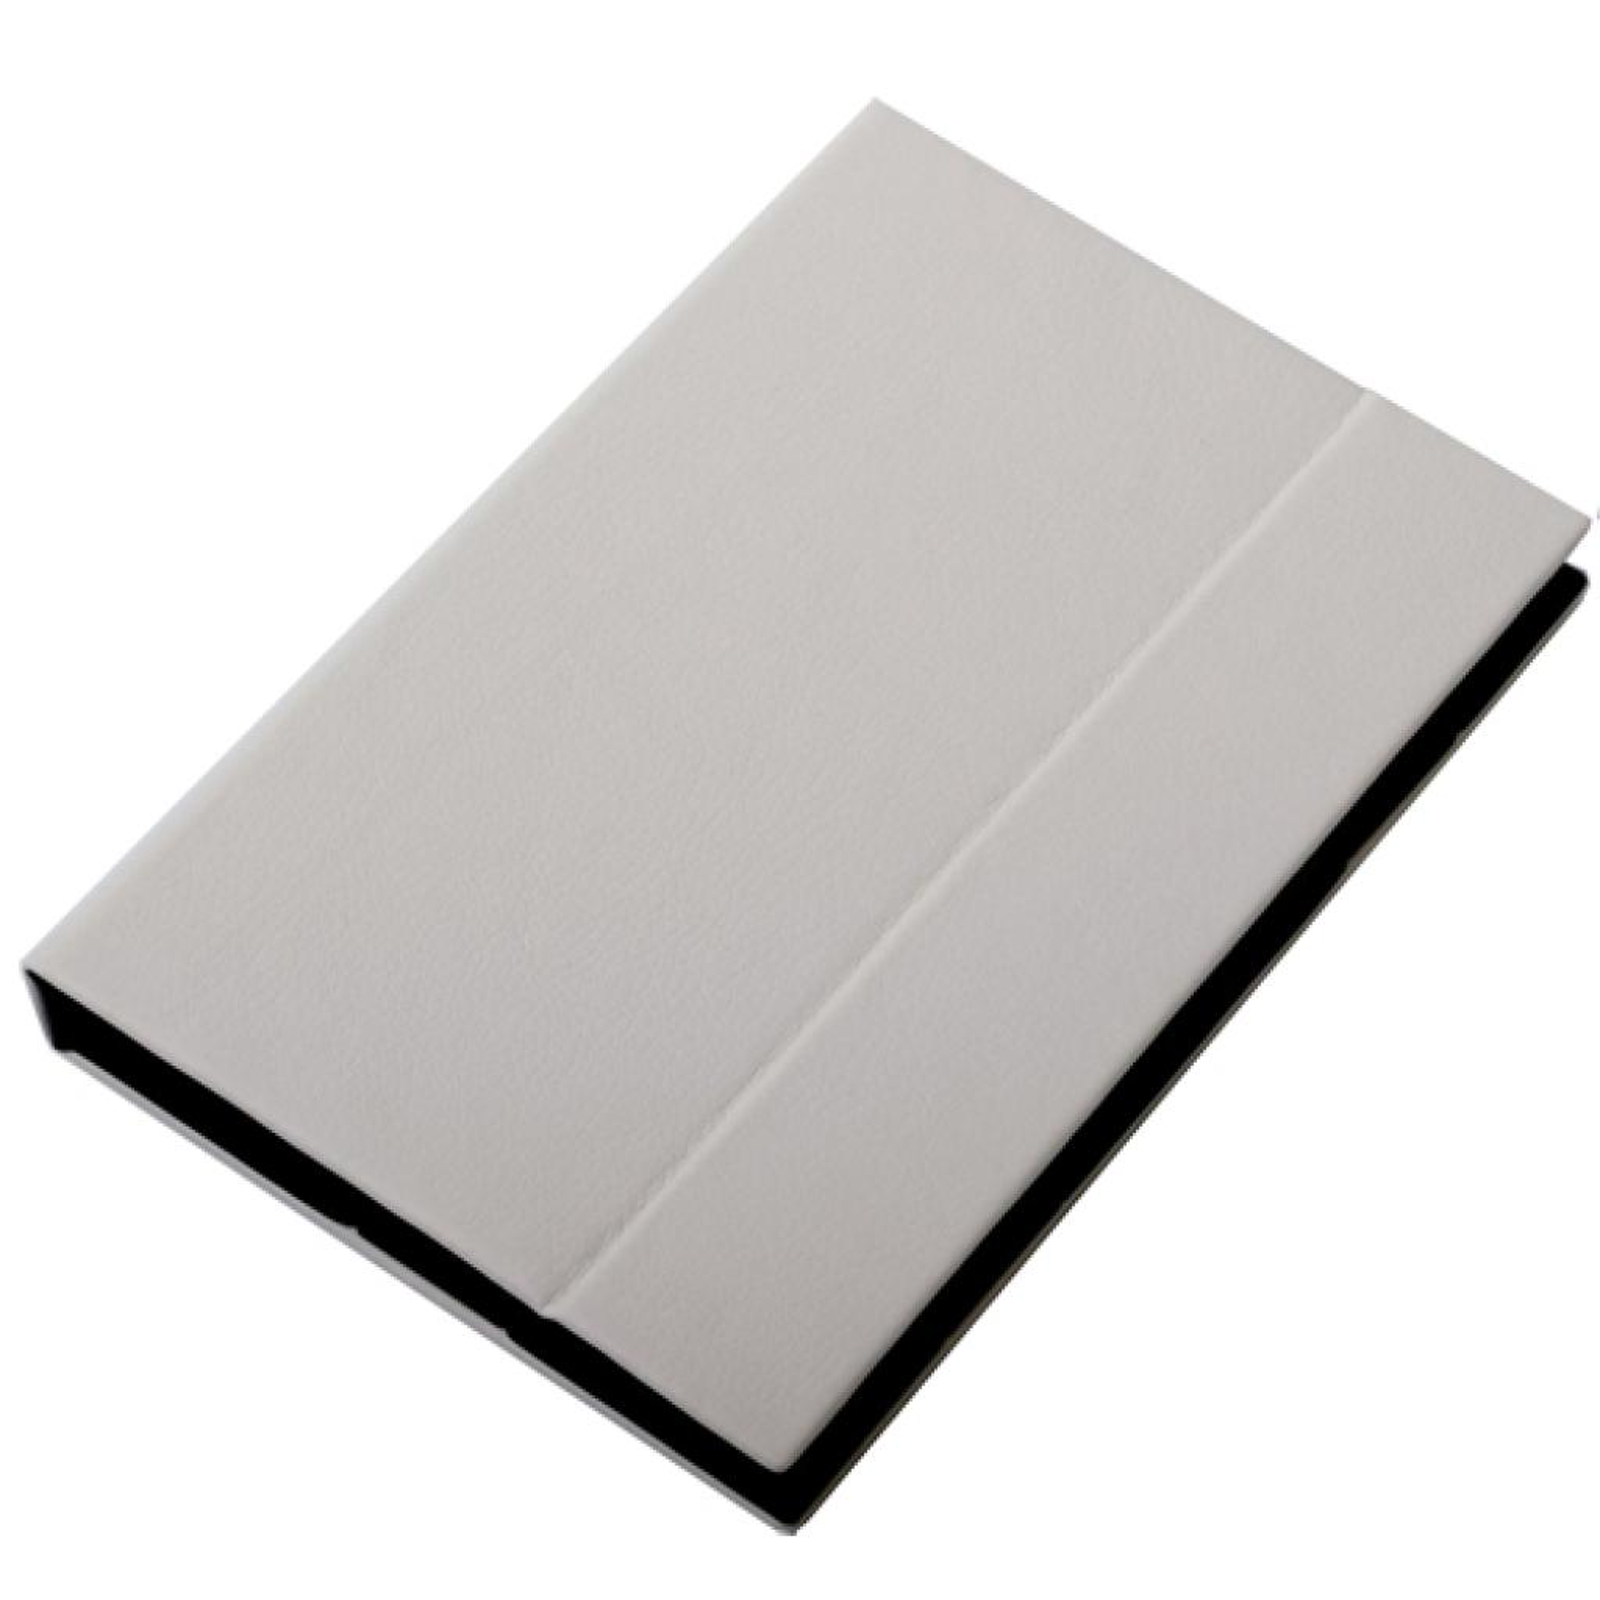 Чехол для планшета Vento 8 Desire Matt - white